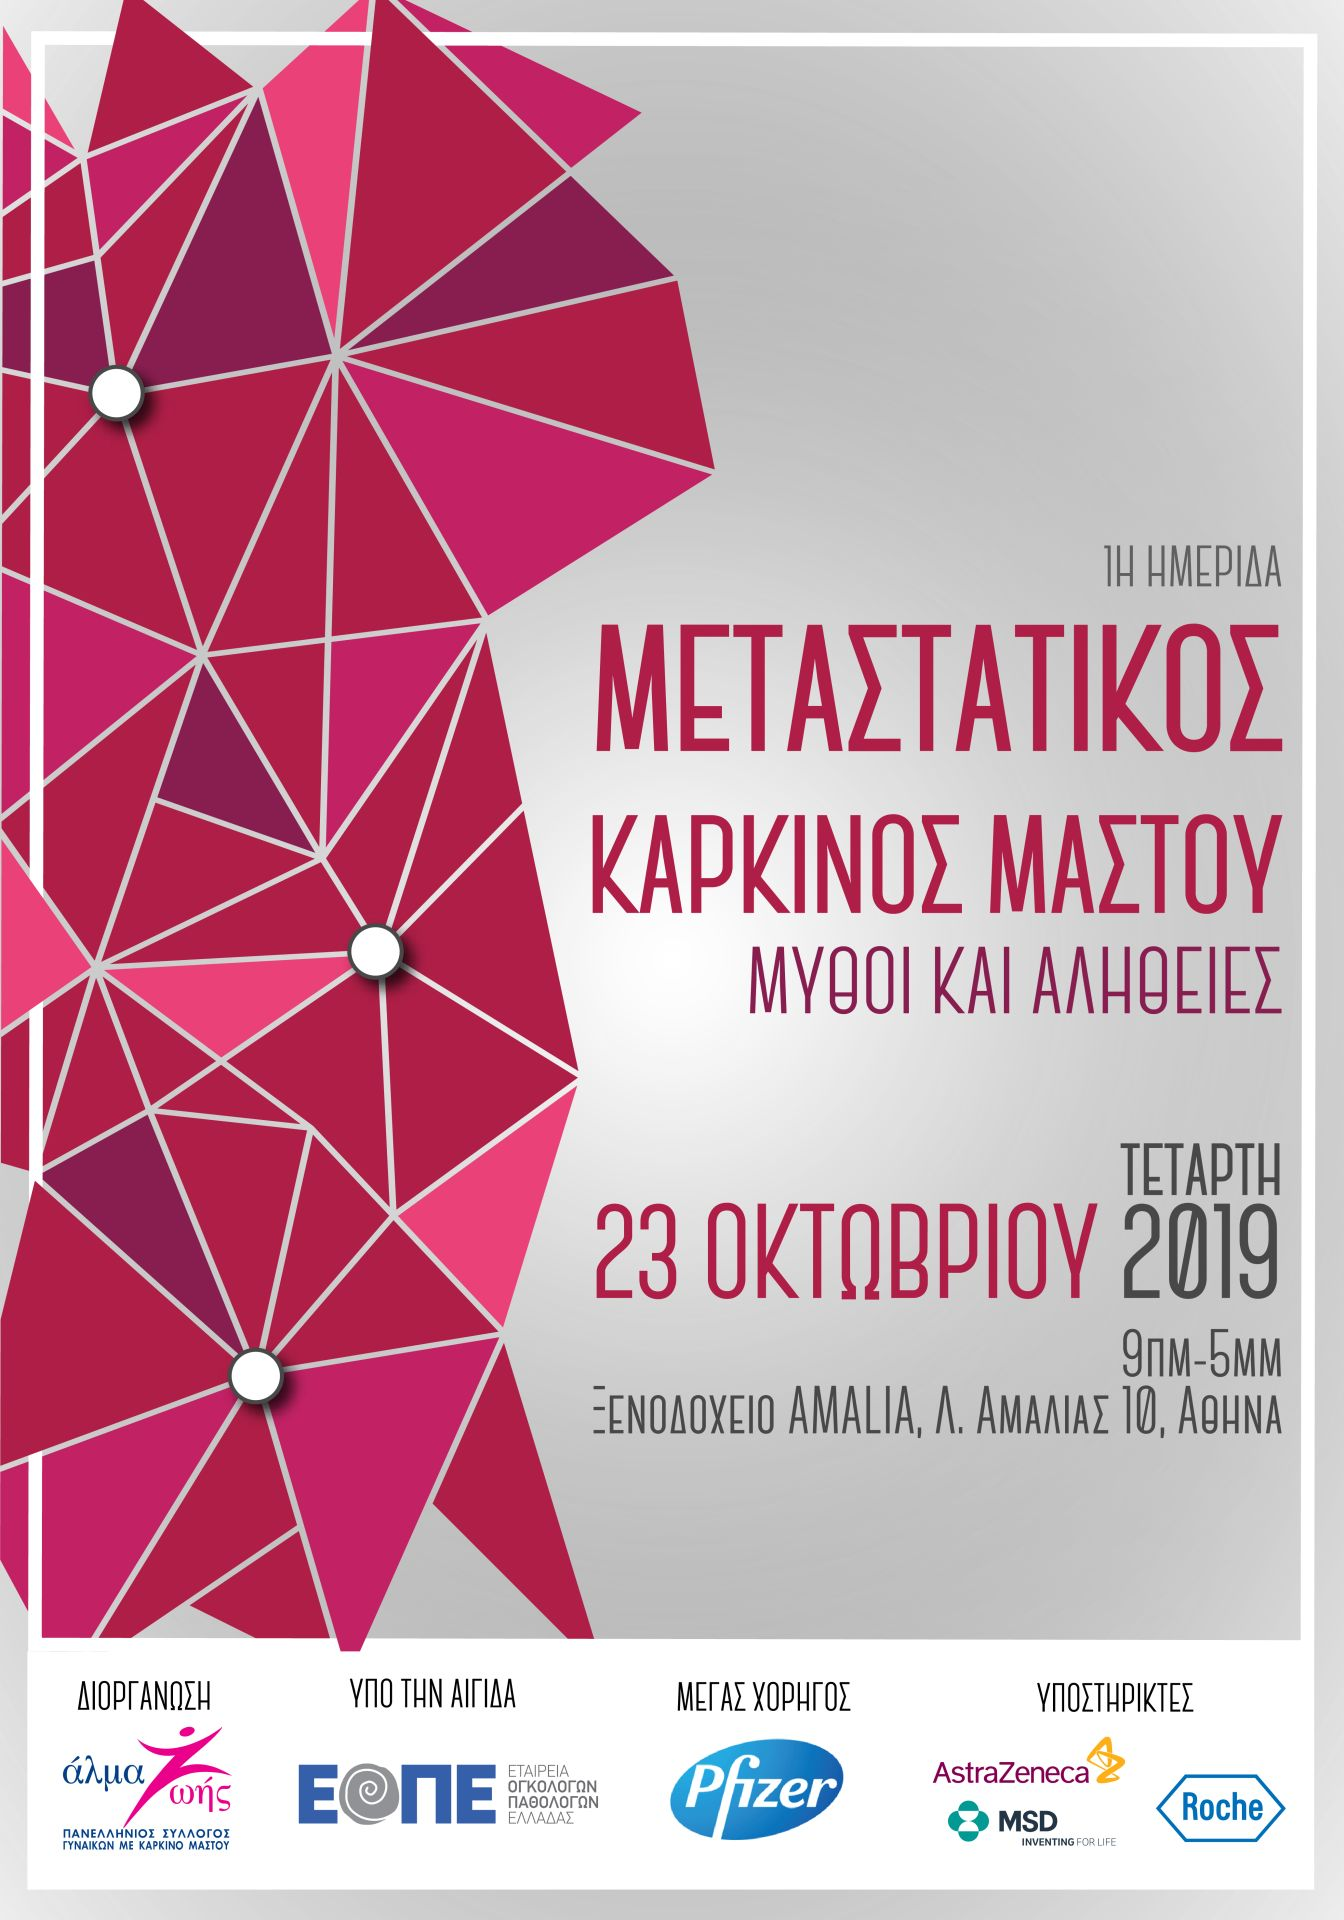 POSTER ΗΜΕΡΙΔΑ ΜΕΤΑΣΤΑΤΙΚΟΣ ΚΑΡΚΙΝΟΣ ΜΑΣΤΟΥ